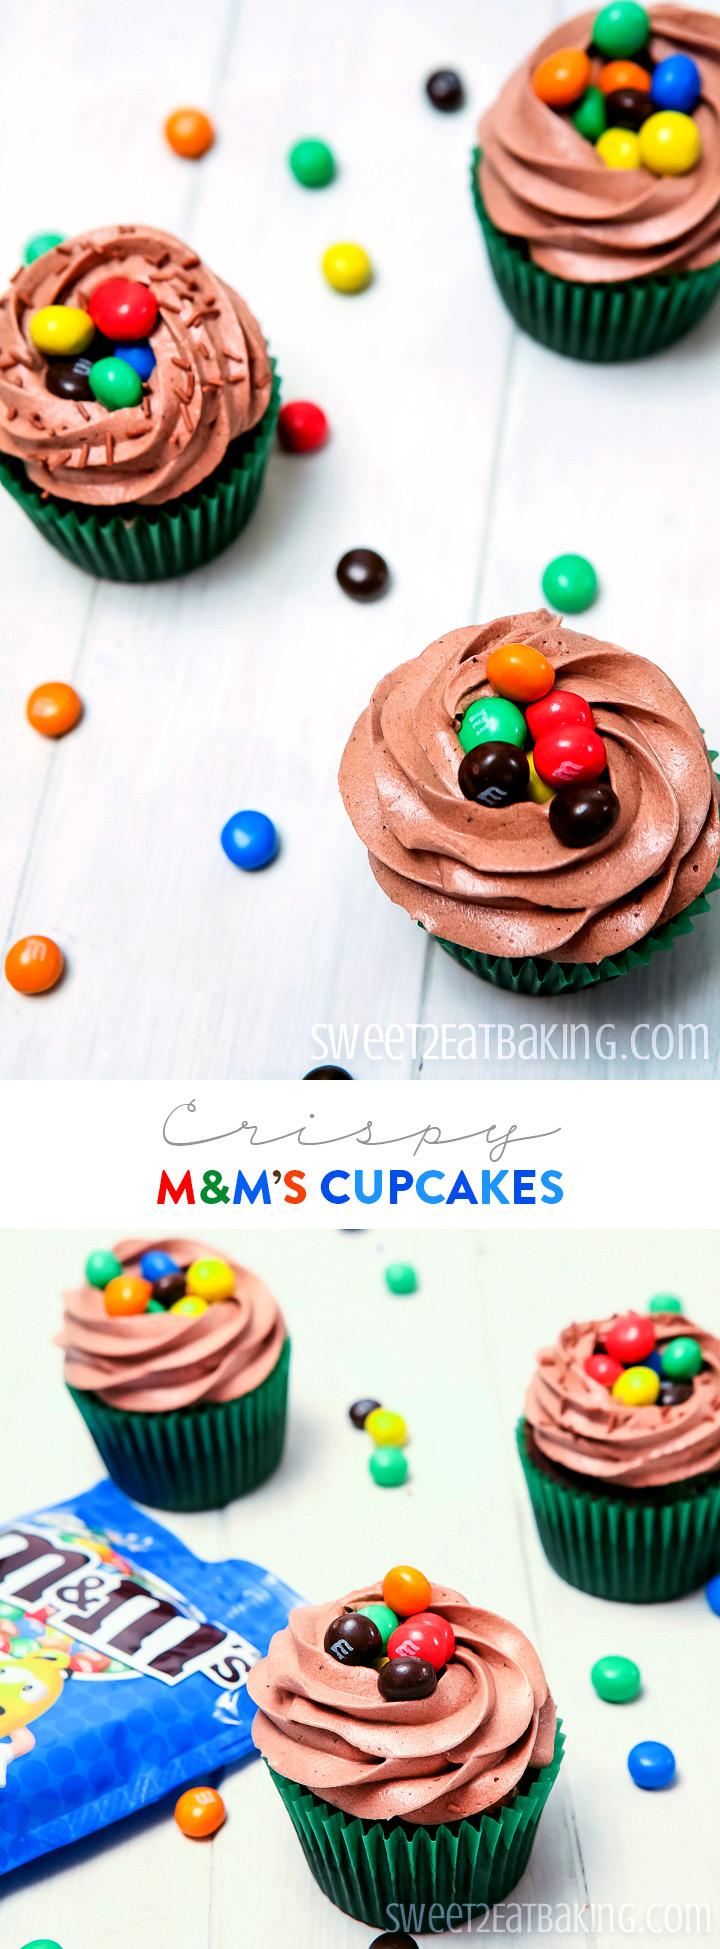 Crispy M&M's Cupcakes Recipe by Sweet2EatBaking.com